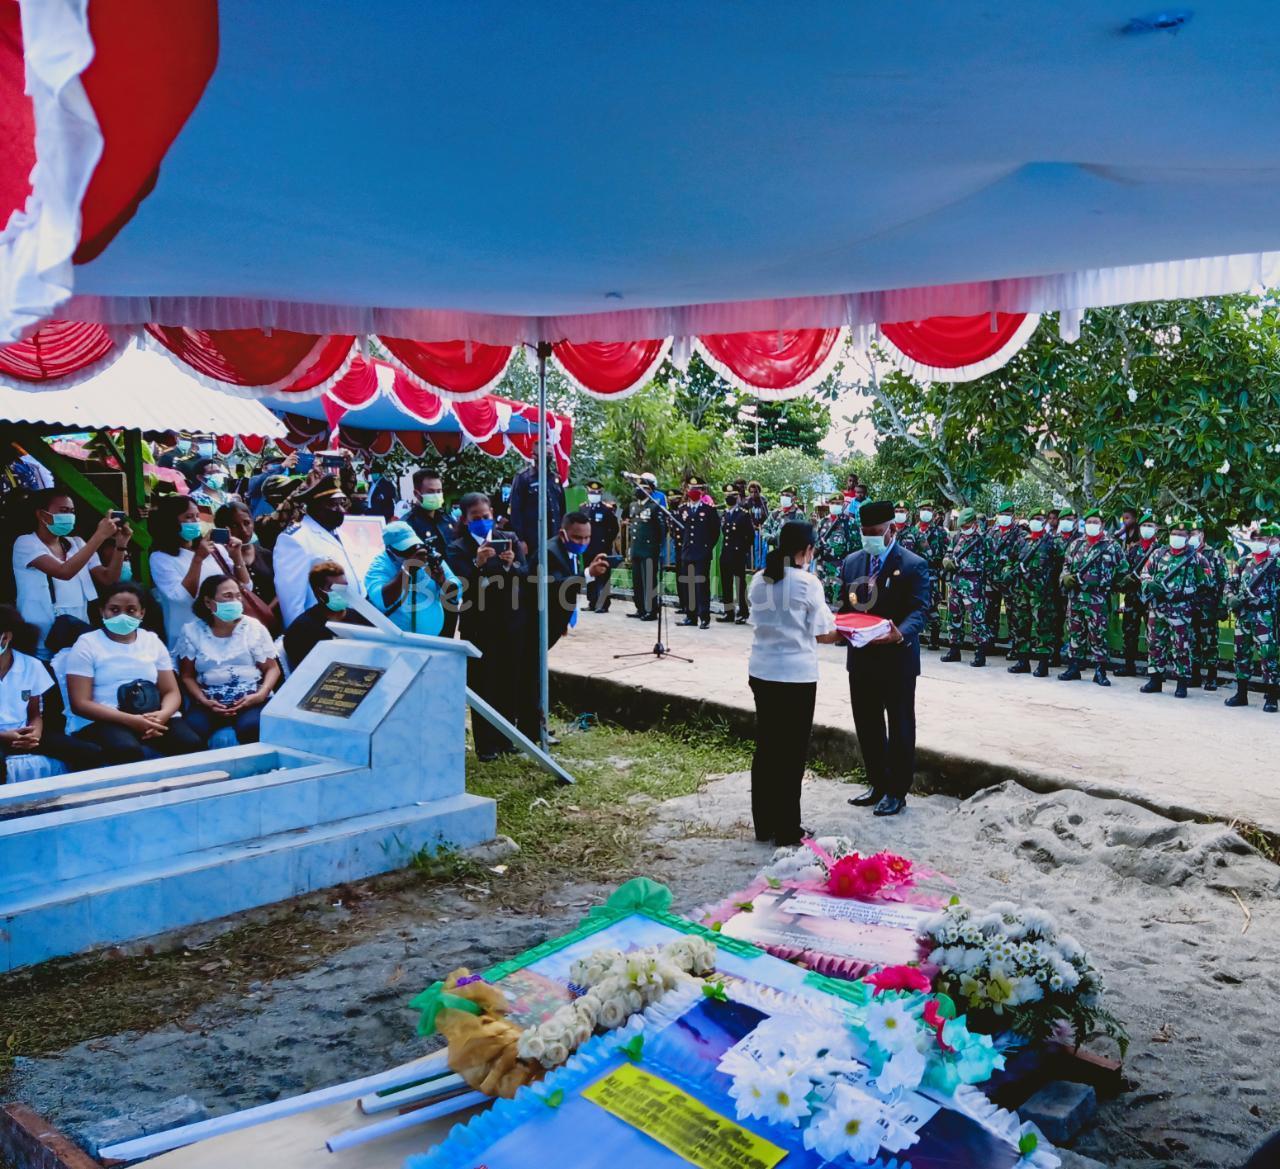 Gubernur PB, Pimpin Pemakaman Alm. Bupati Manokwari Demas Paulus Mandacan 1 IMG 20200423 WA0031